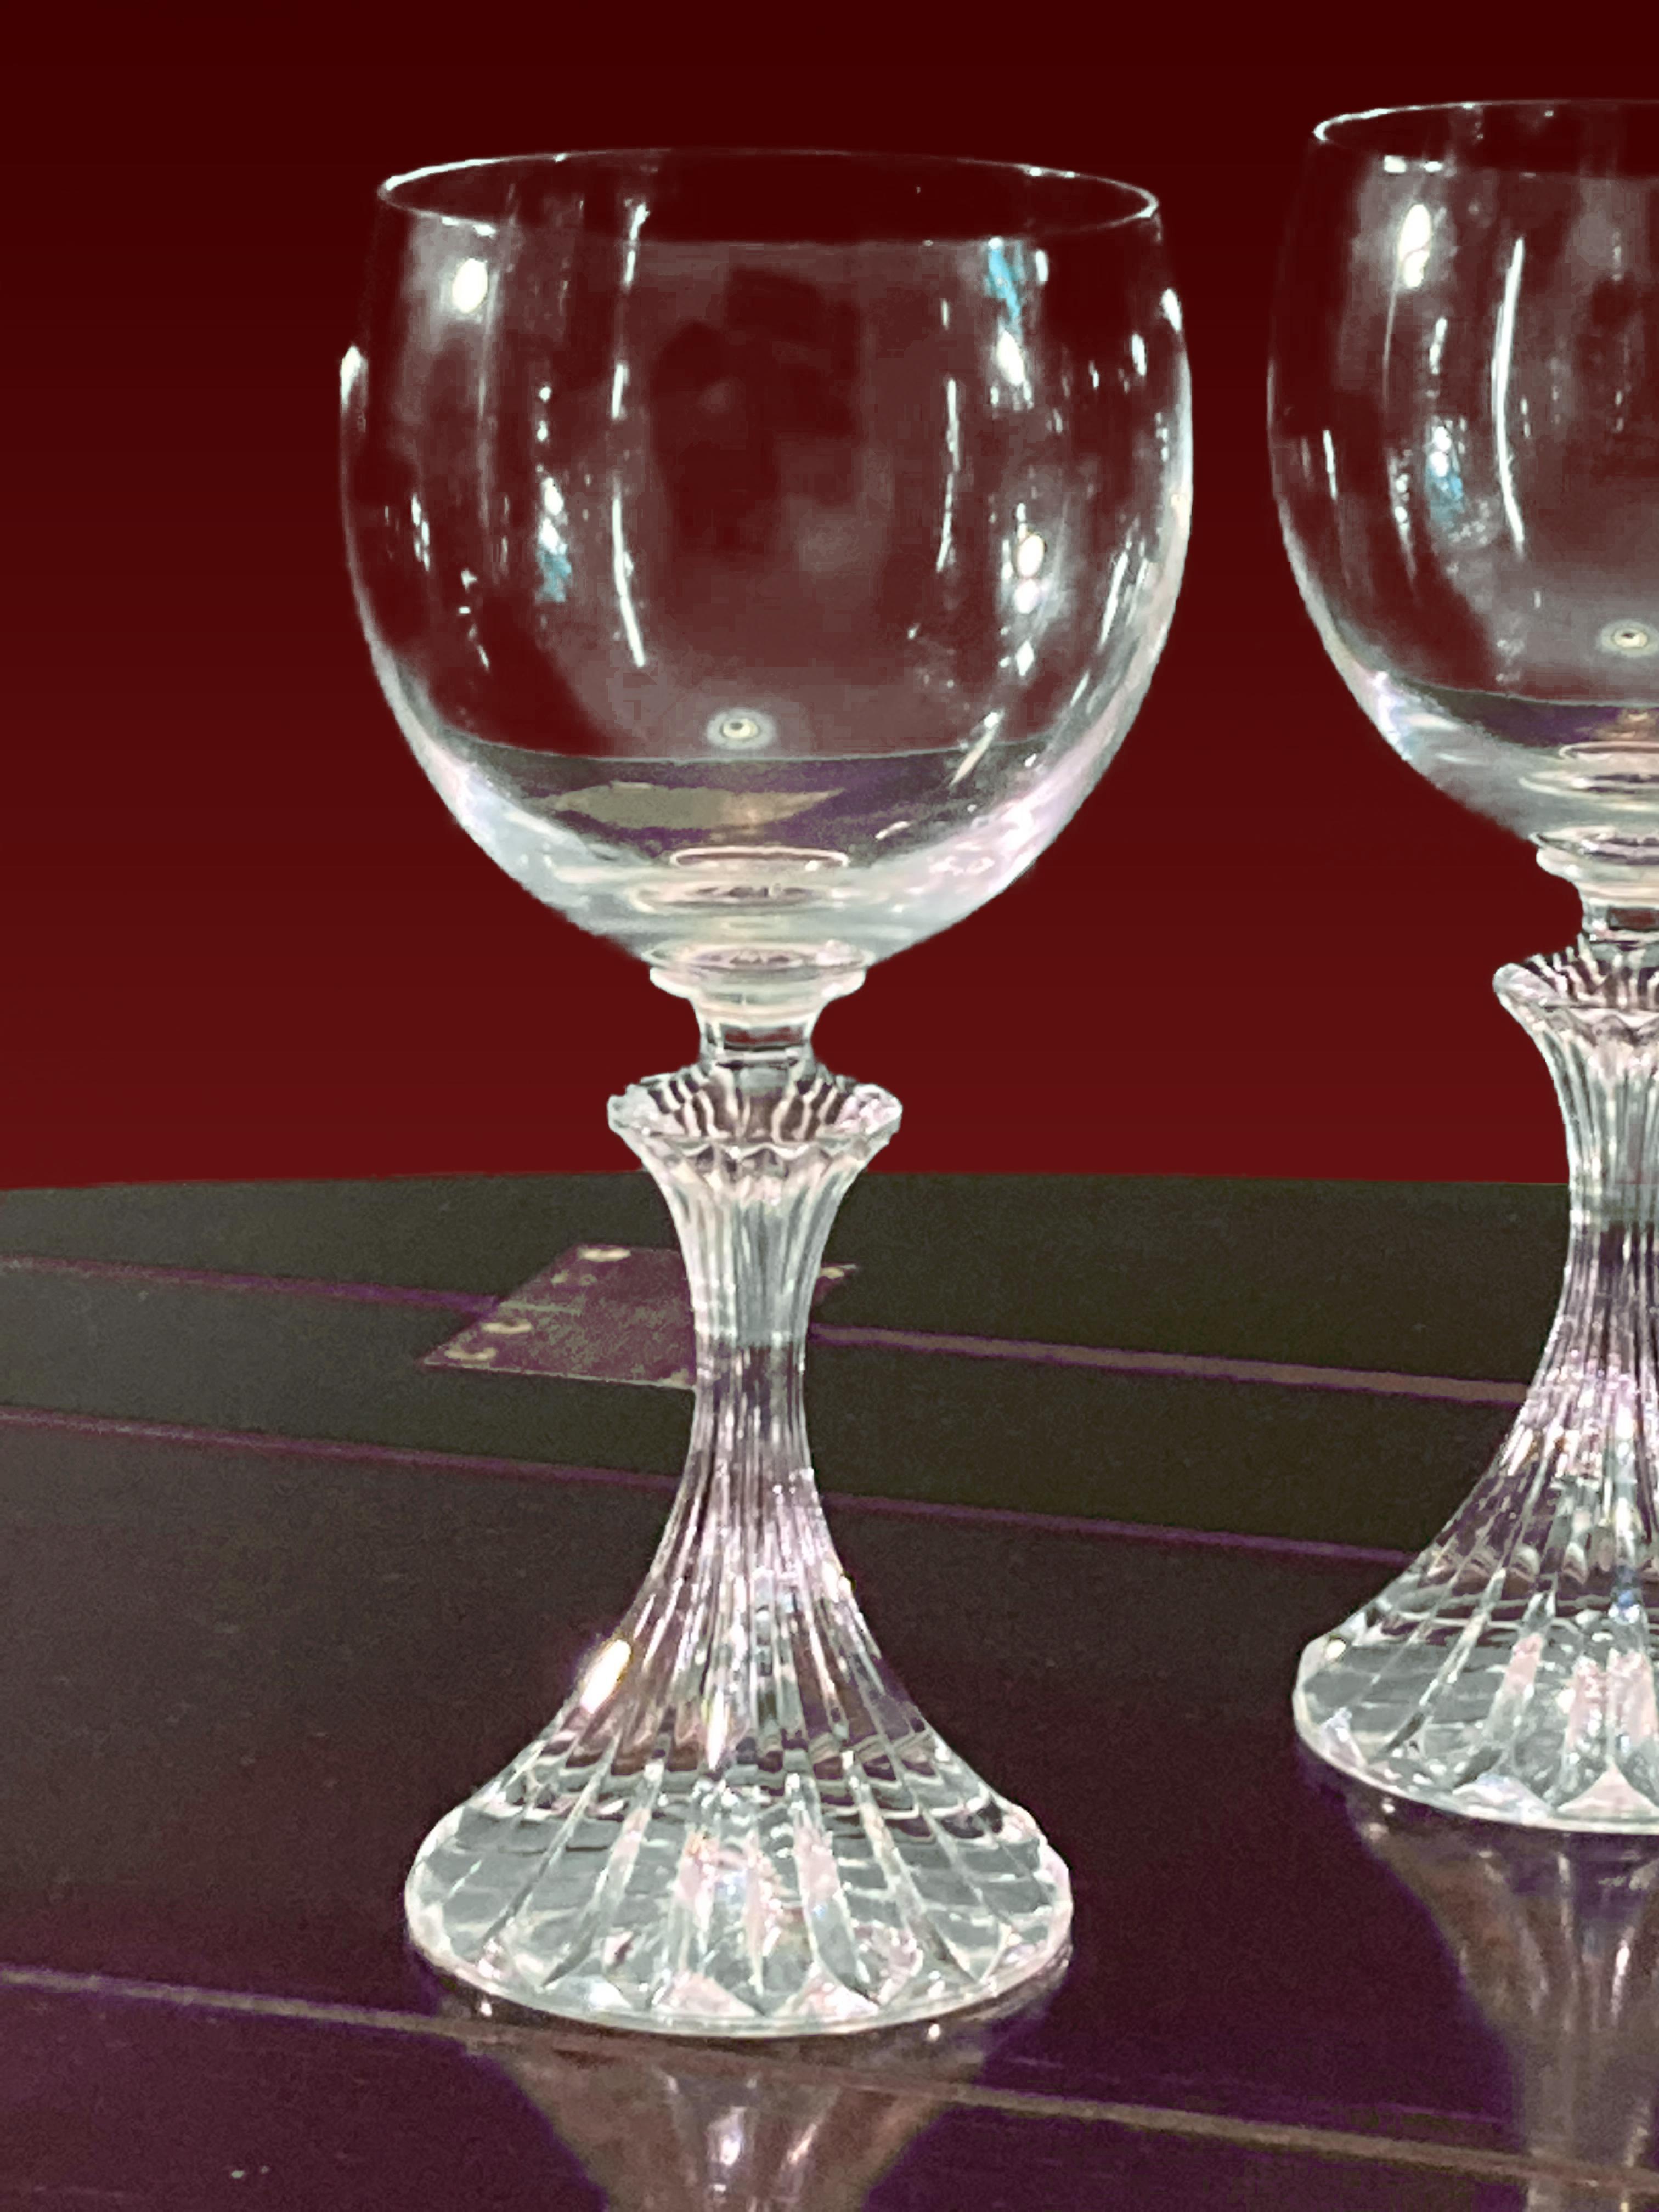 WineGlasses1-Single copy